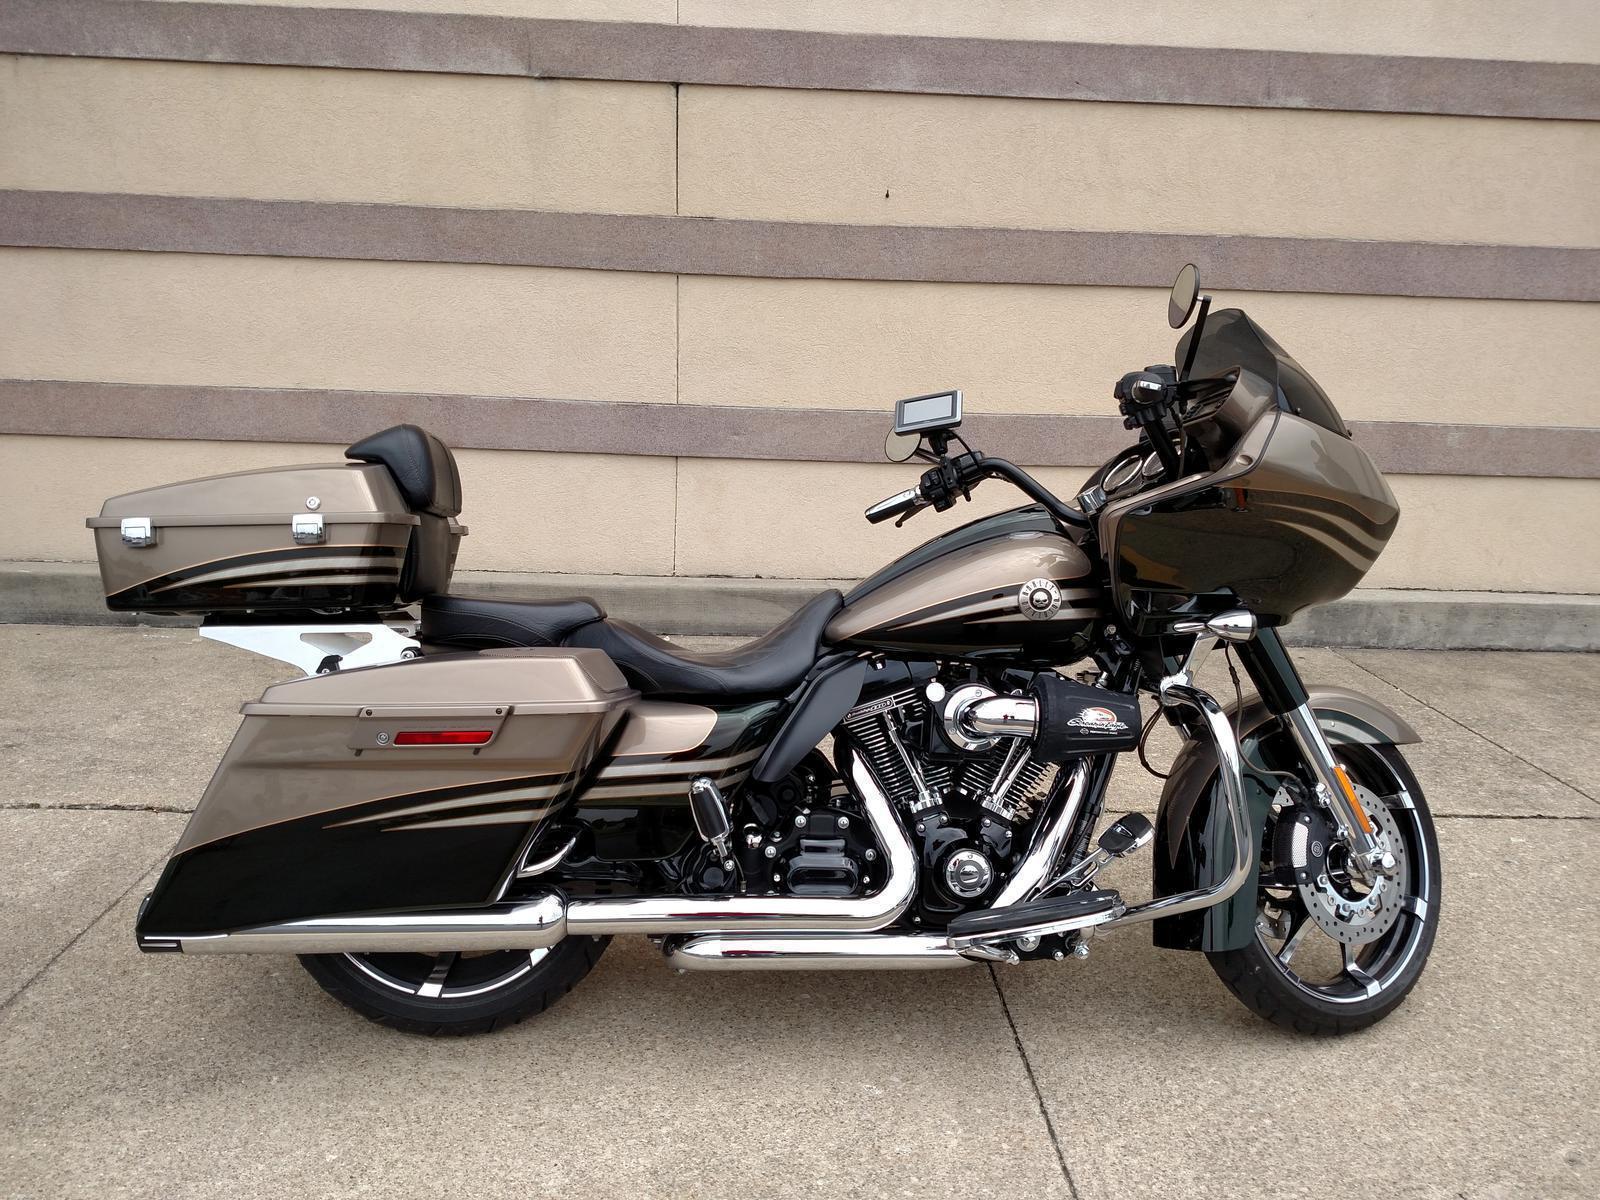 Inventory from Suzuki and Harley-Davidson® Pony Powersports